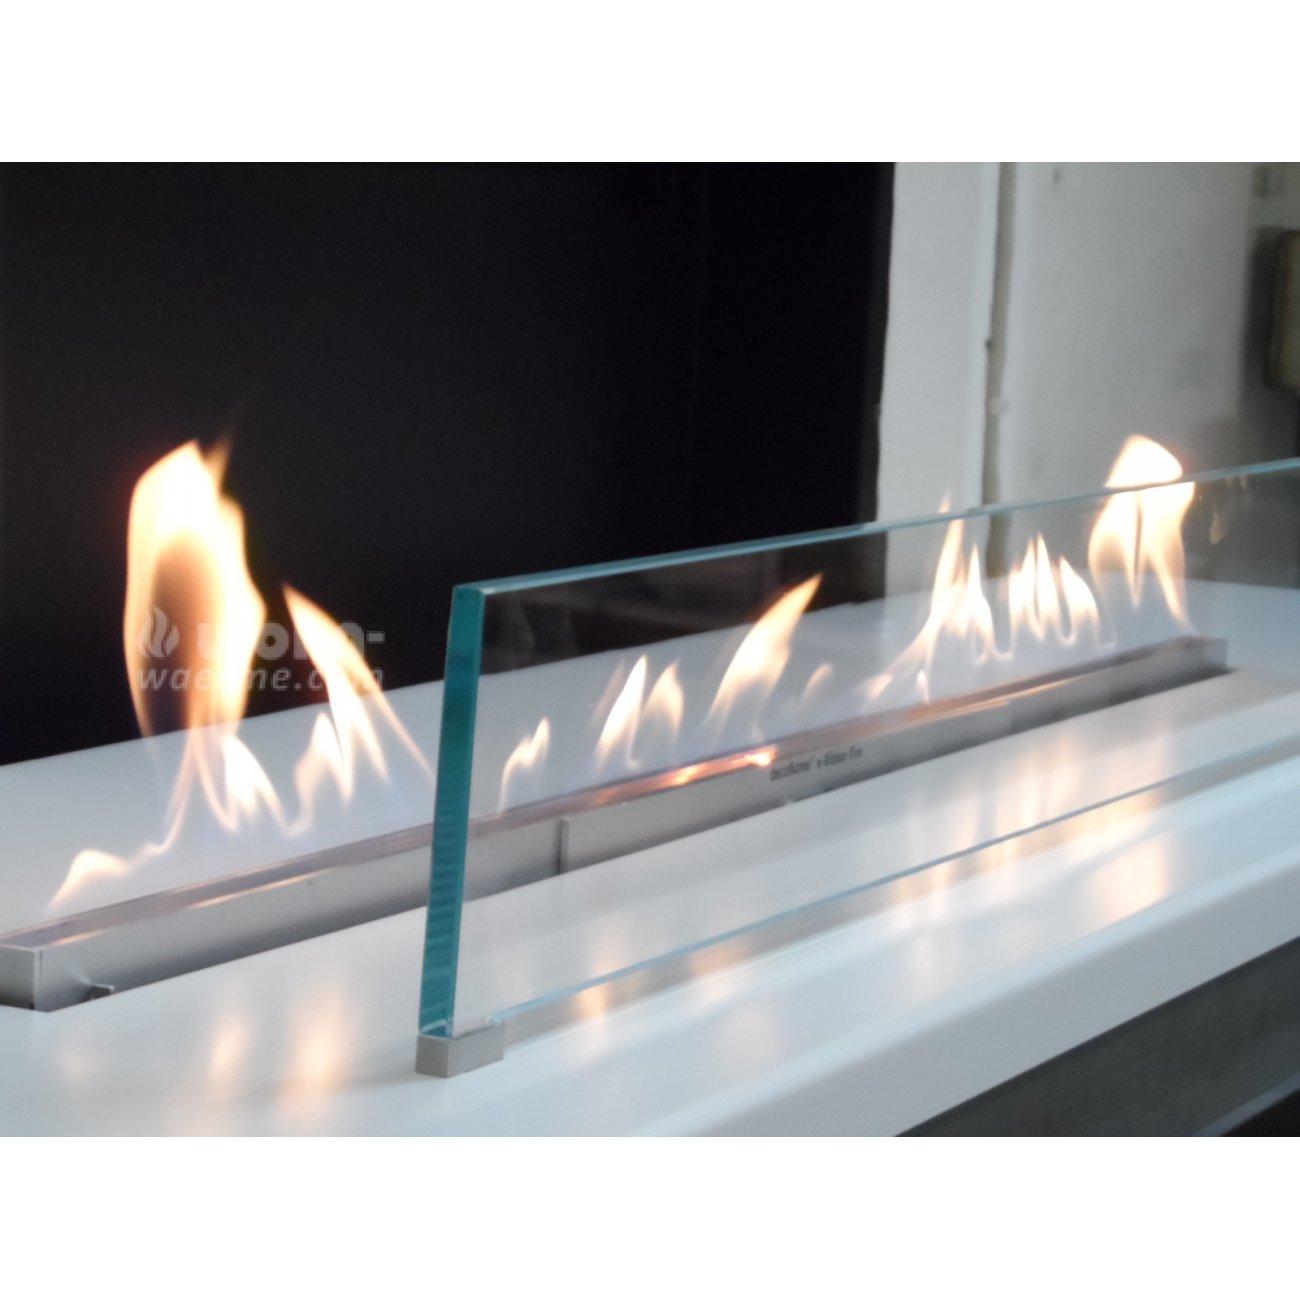 einbau ethanolkamin decoflame e ribbon. Black Bedroom Furniture Sets. Home Design Ideas